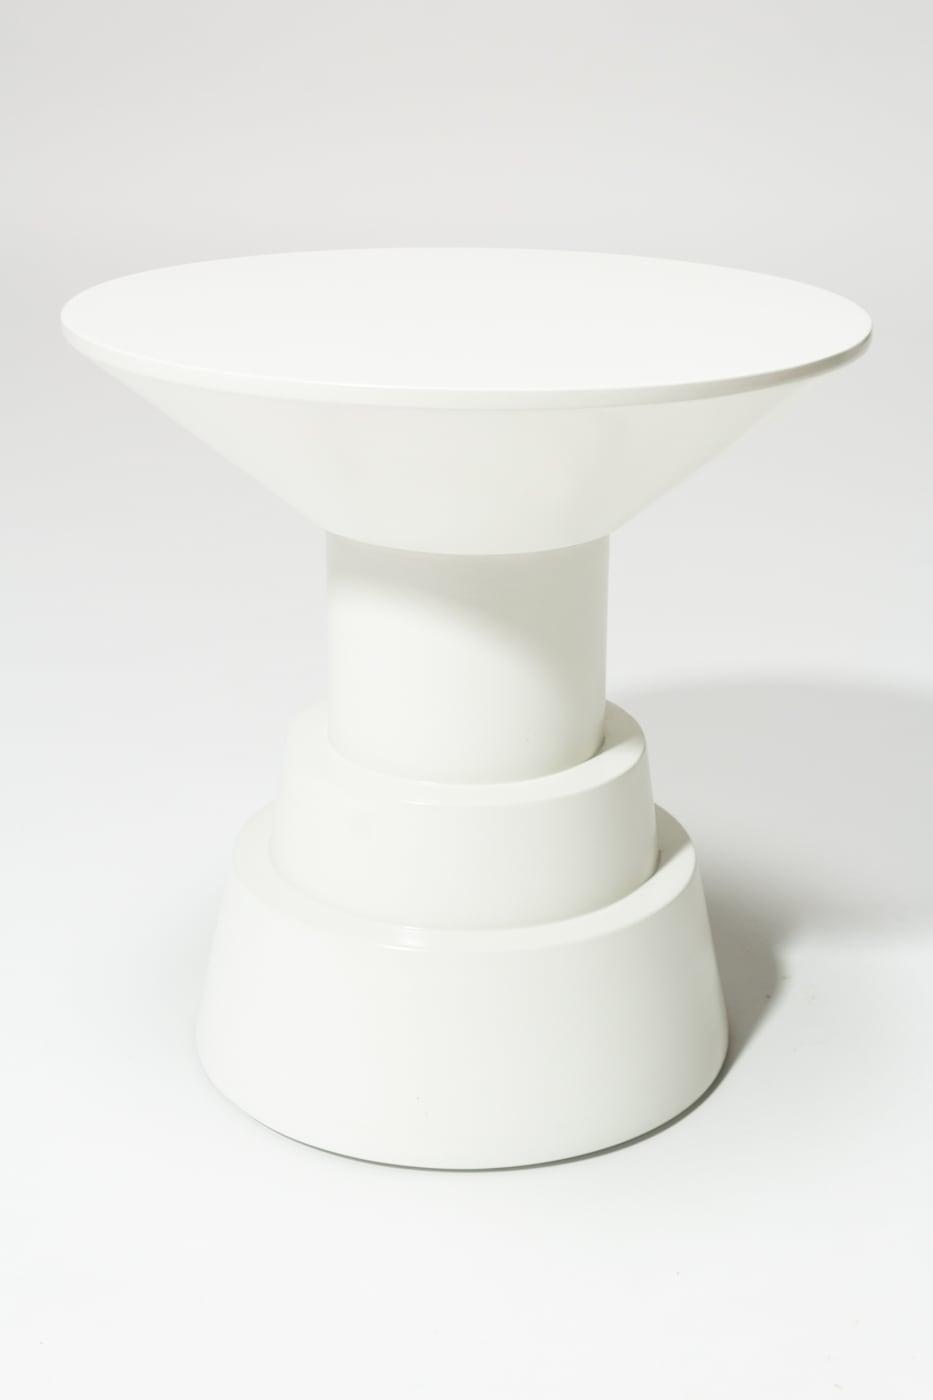 Tb194 South White Lacquer Side Table Pedestal Prop Rental